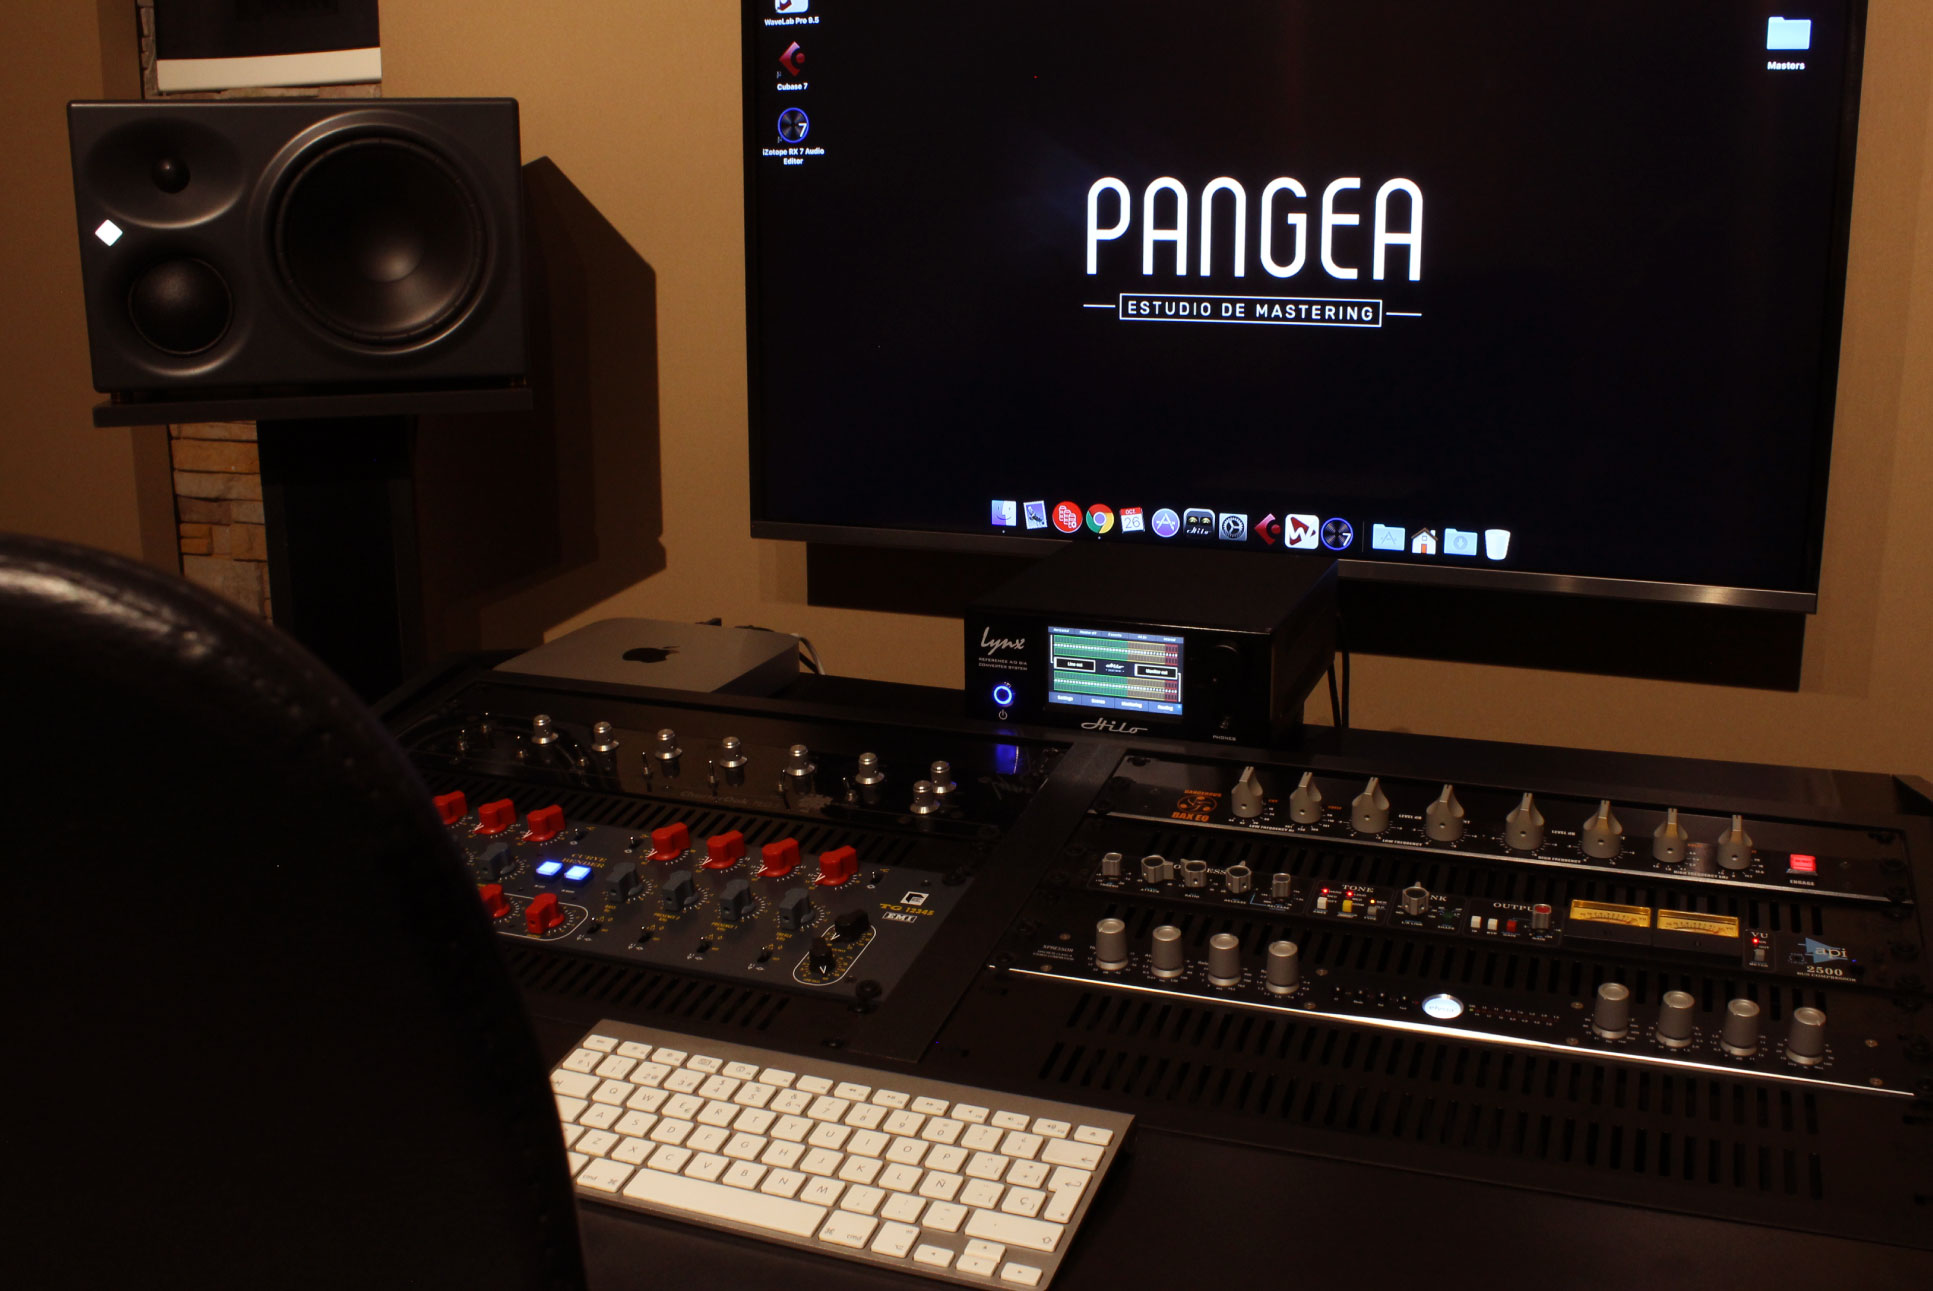 Pangea - Estudio de Mastering